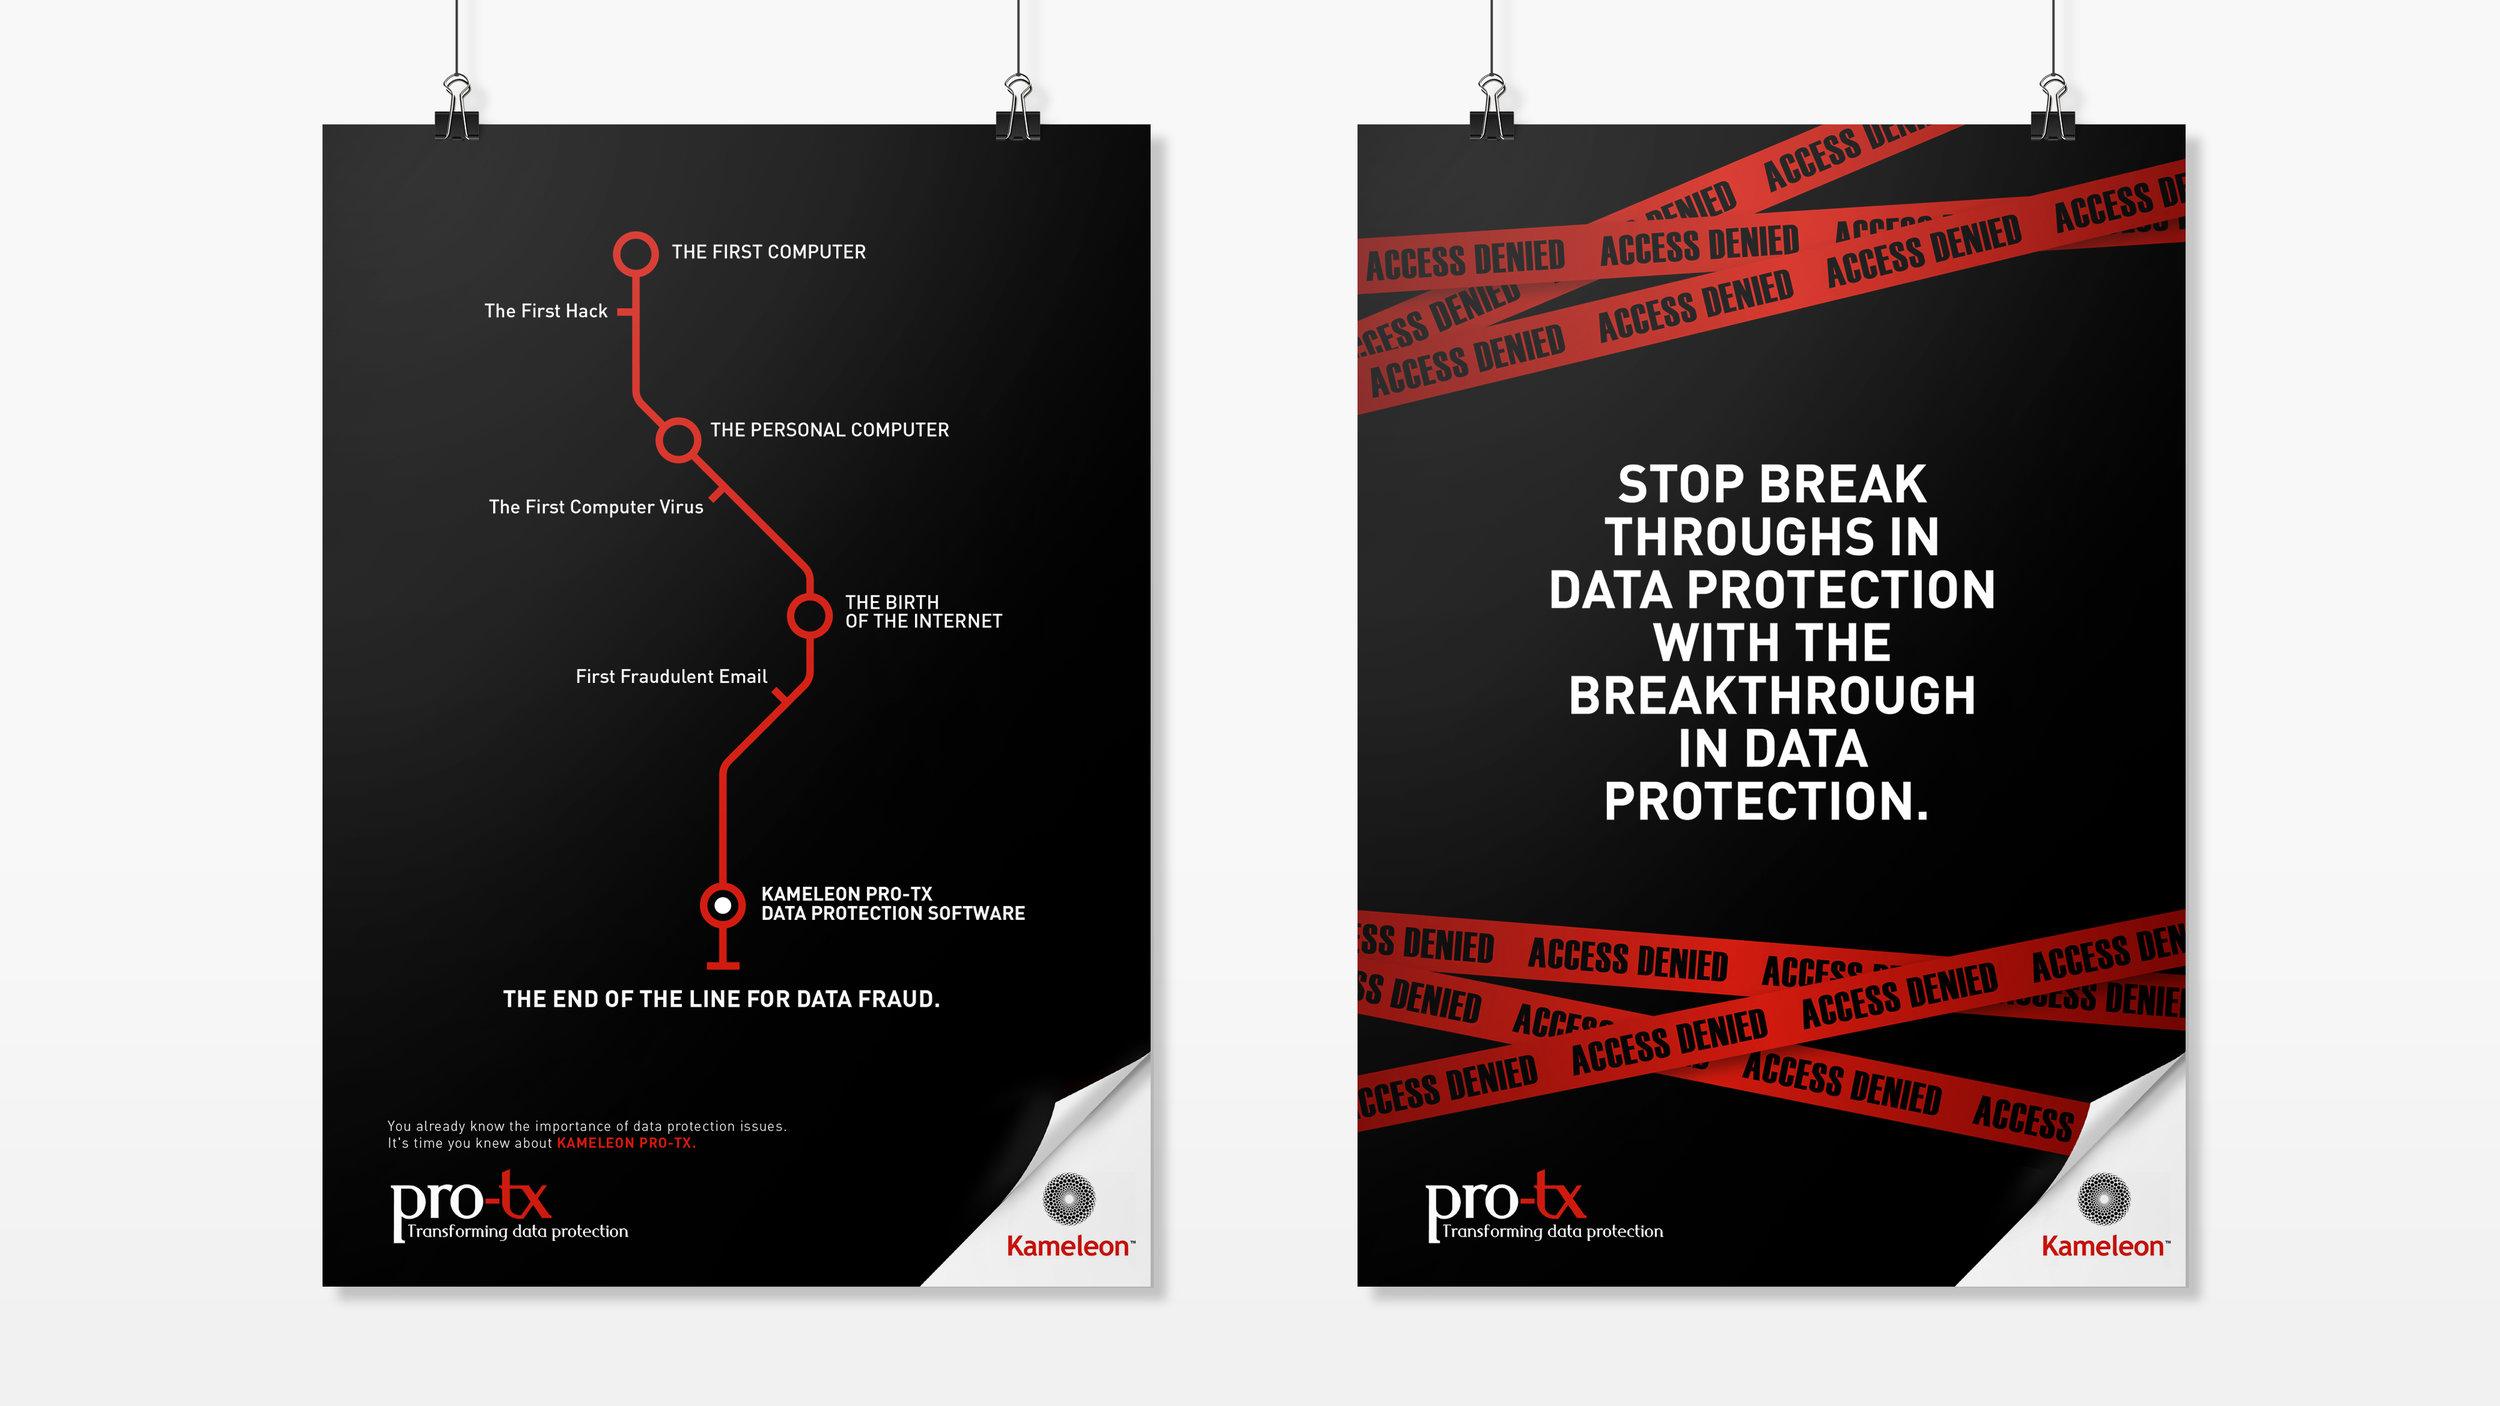 Brand_republica_Mastek_Kameleon_pro-tx_advertising_campaign_02.jpg